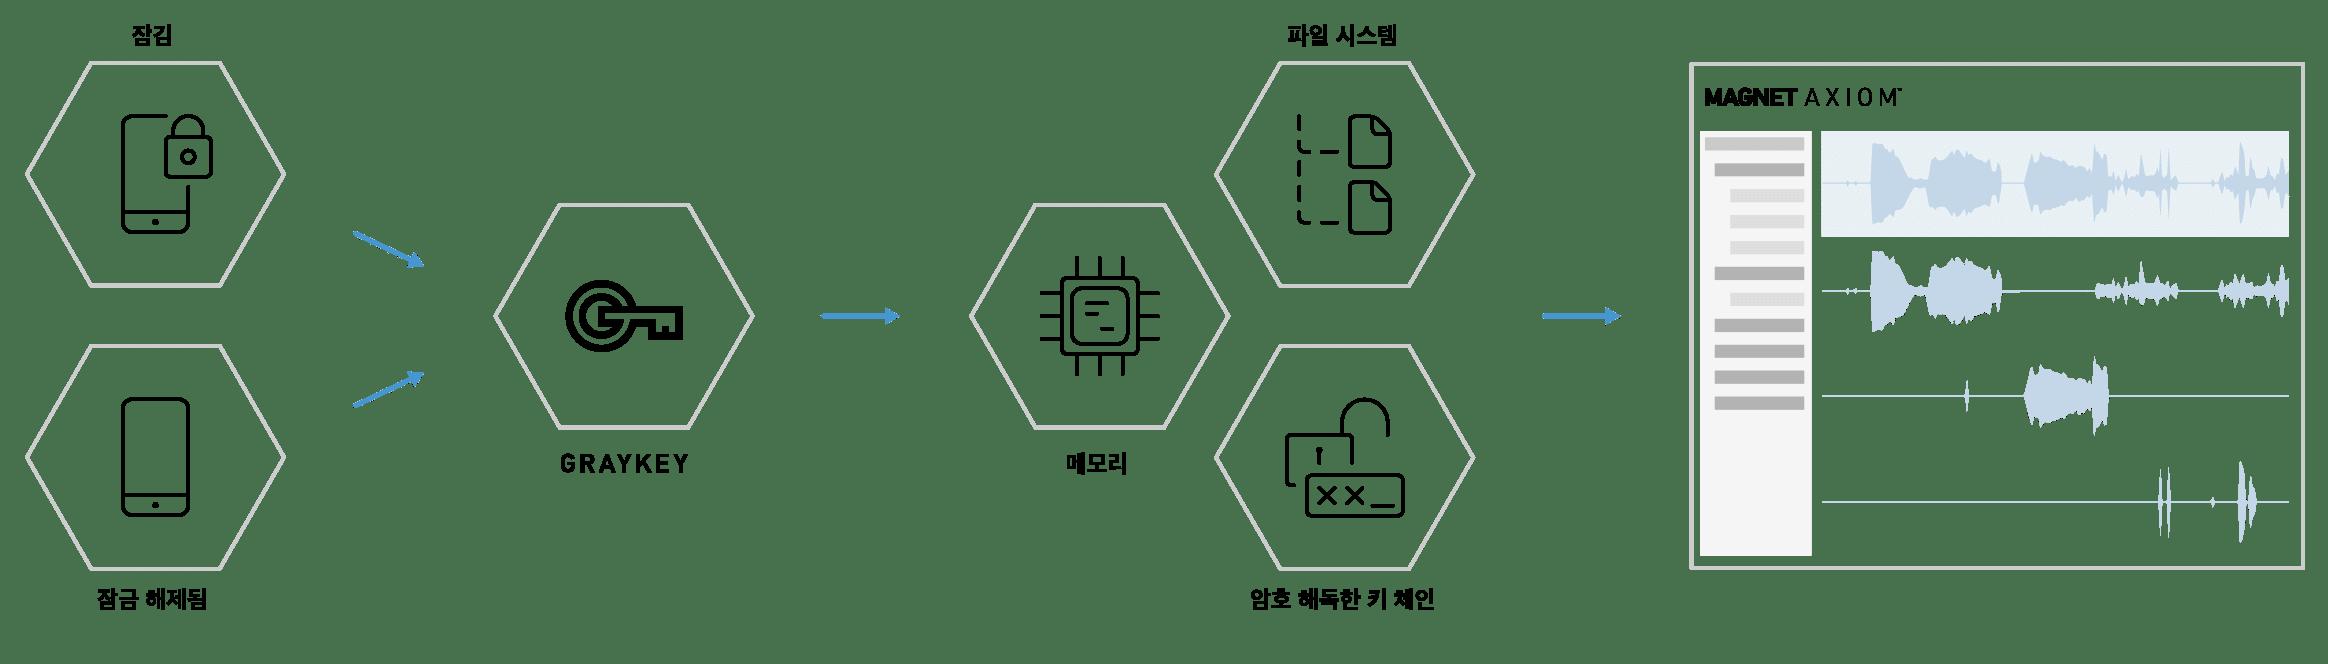 AXIOM GrayKey Diagram - Korean